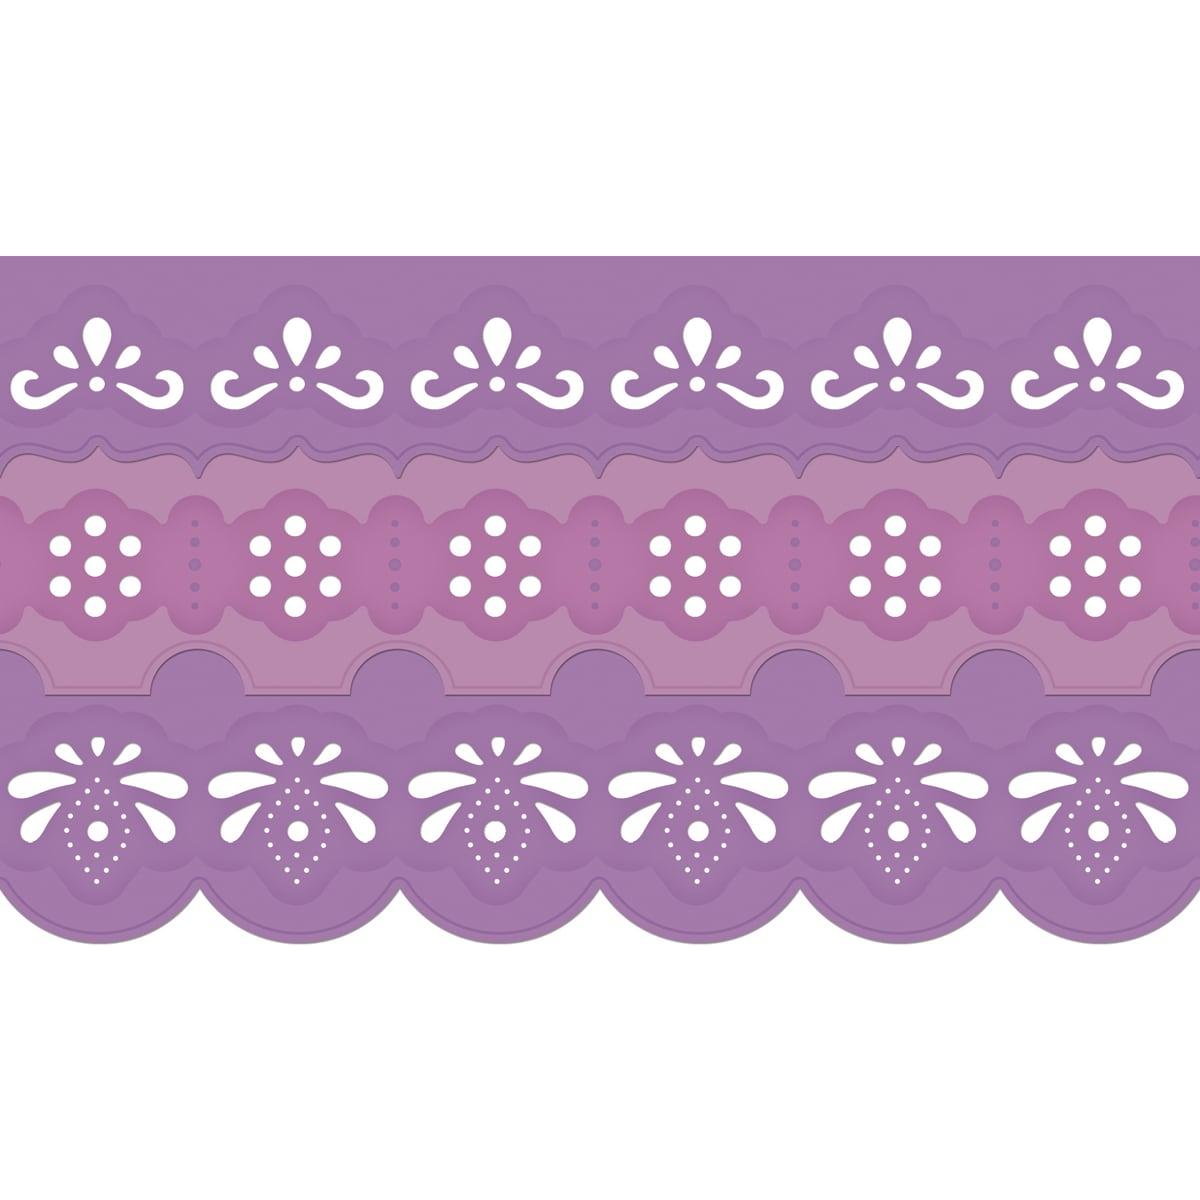 Spellbinders Edgeabilities Dies-Classic Decorative Inserts 4